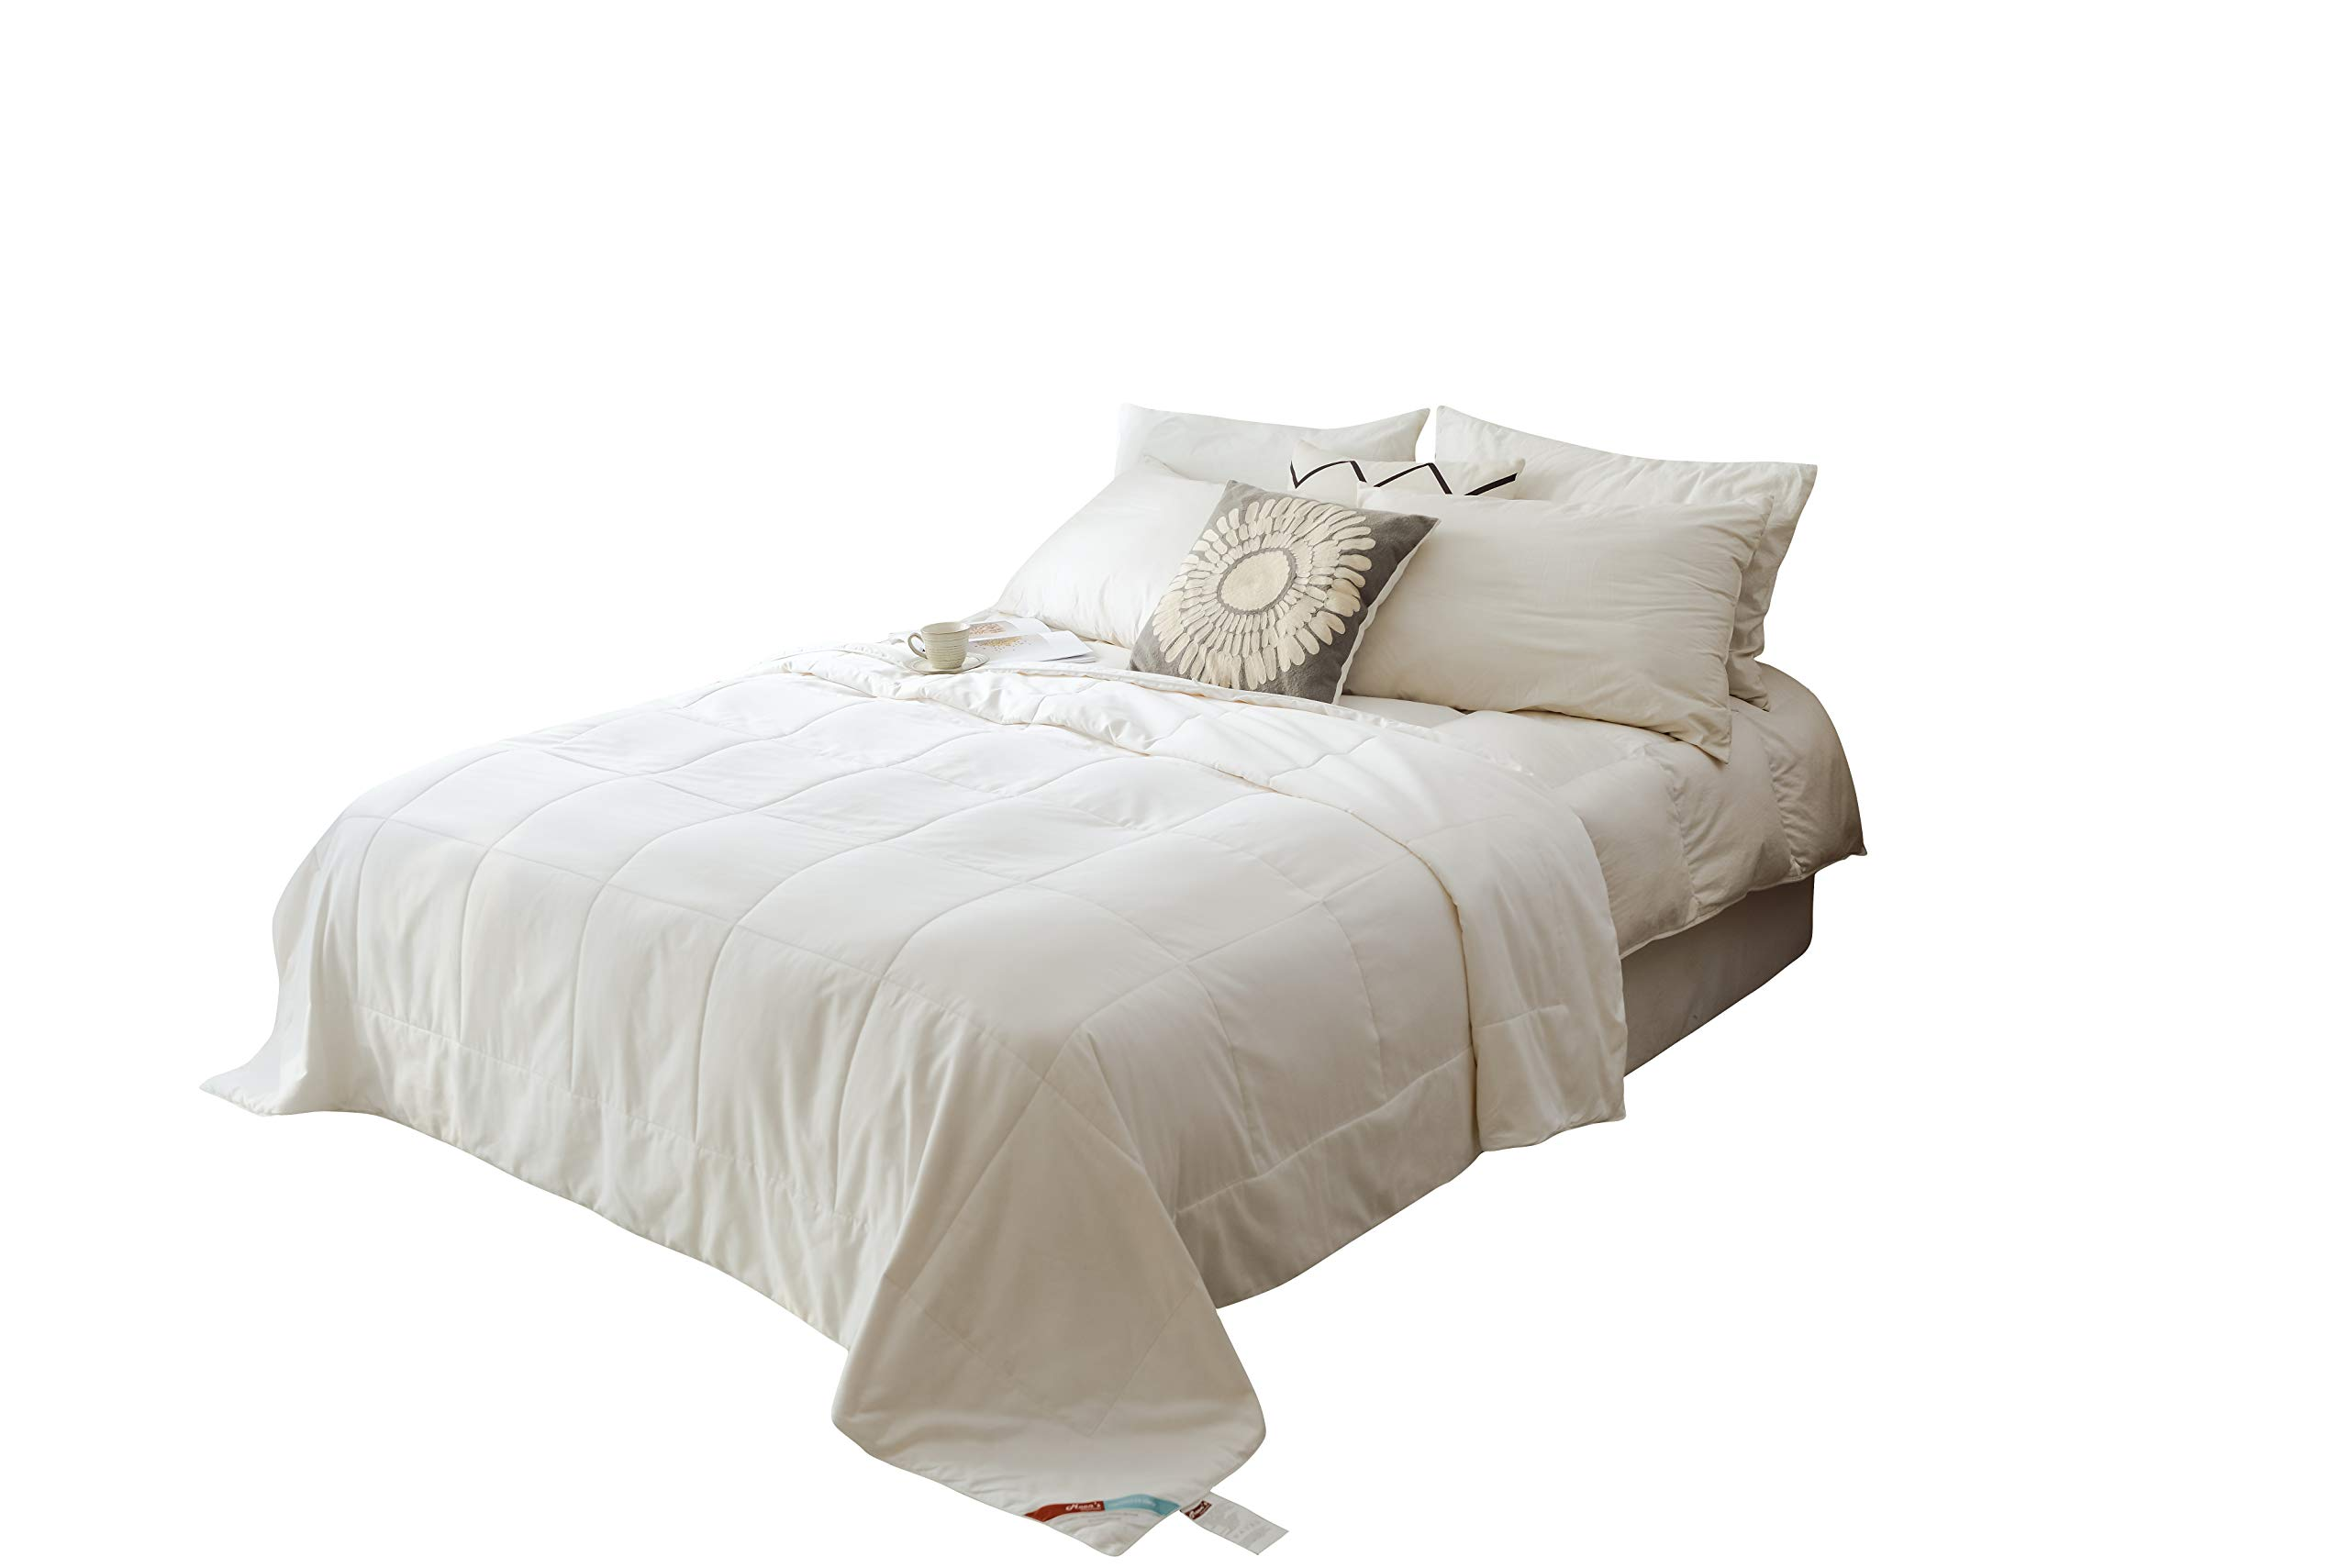 MOON'S SLEEPWARES [ Machine Washable [ Queen Size ] [ 4.5 Tog Summer ] [ 100% Pure Silk Filling ] Silk Filled Duvet SDMW220x230-1